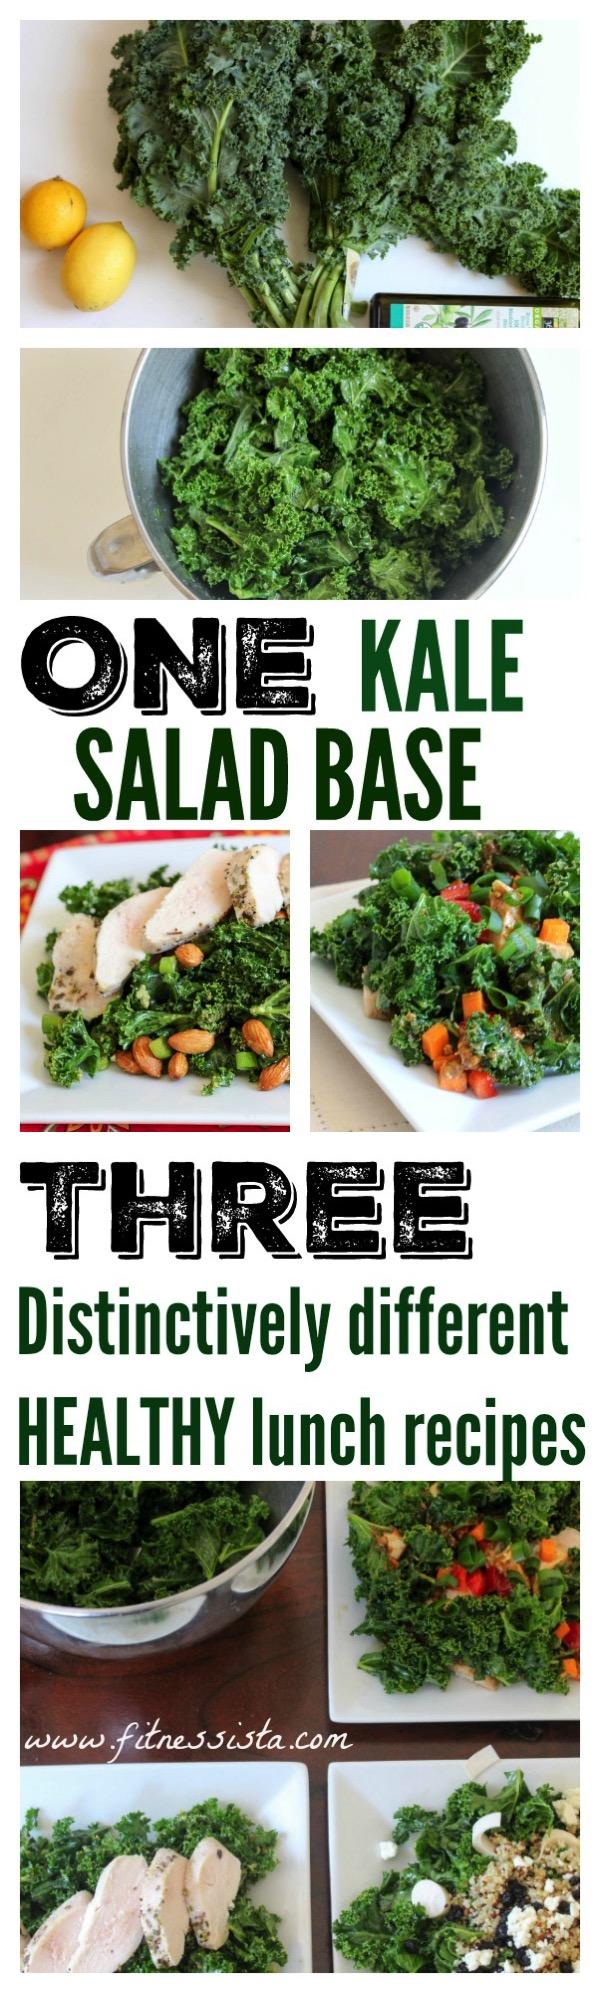 One kale salad base three different salads